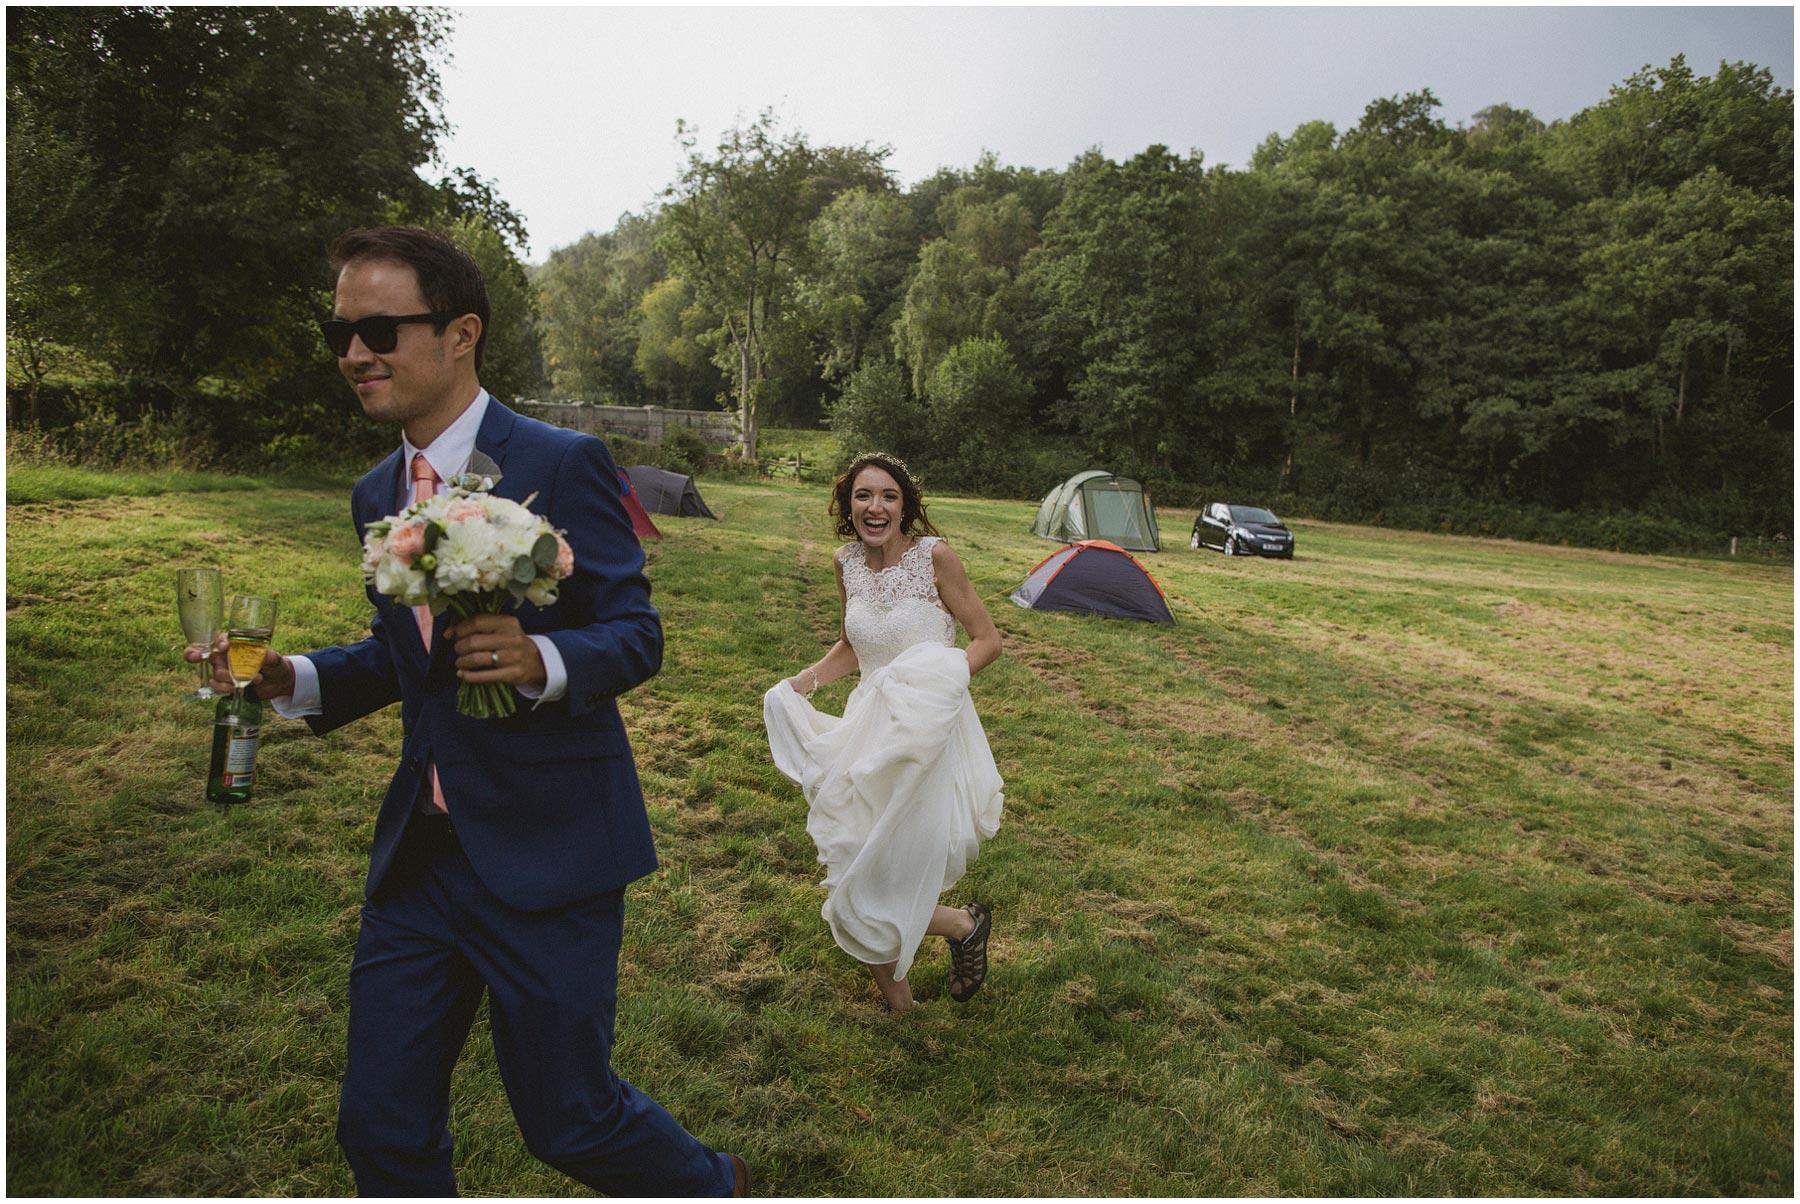 Colehayes-Park-Wedding-Photography_0147